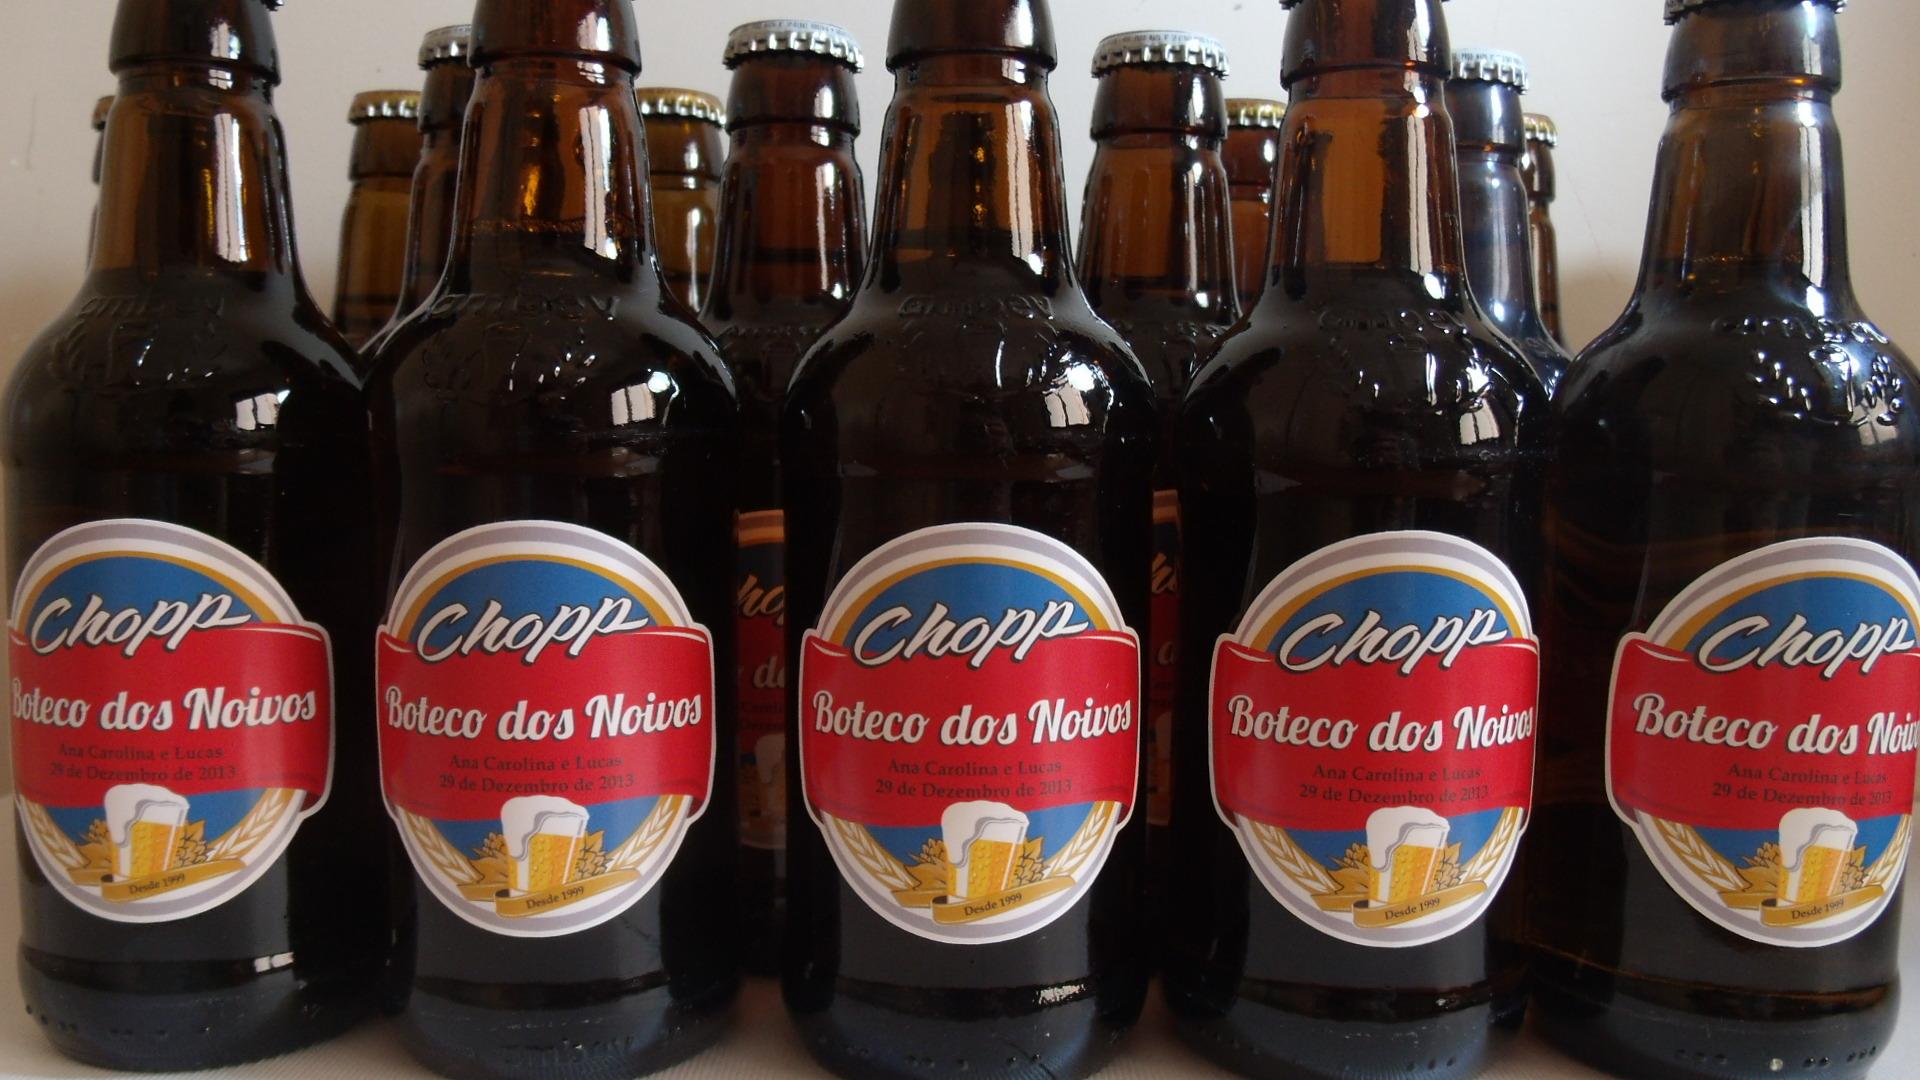 Extremamente Rótulos Mini Garrafa de Cerveja - 300 mL no Elo7 | Pinnkd Atelier  LH49